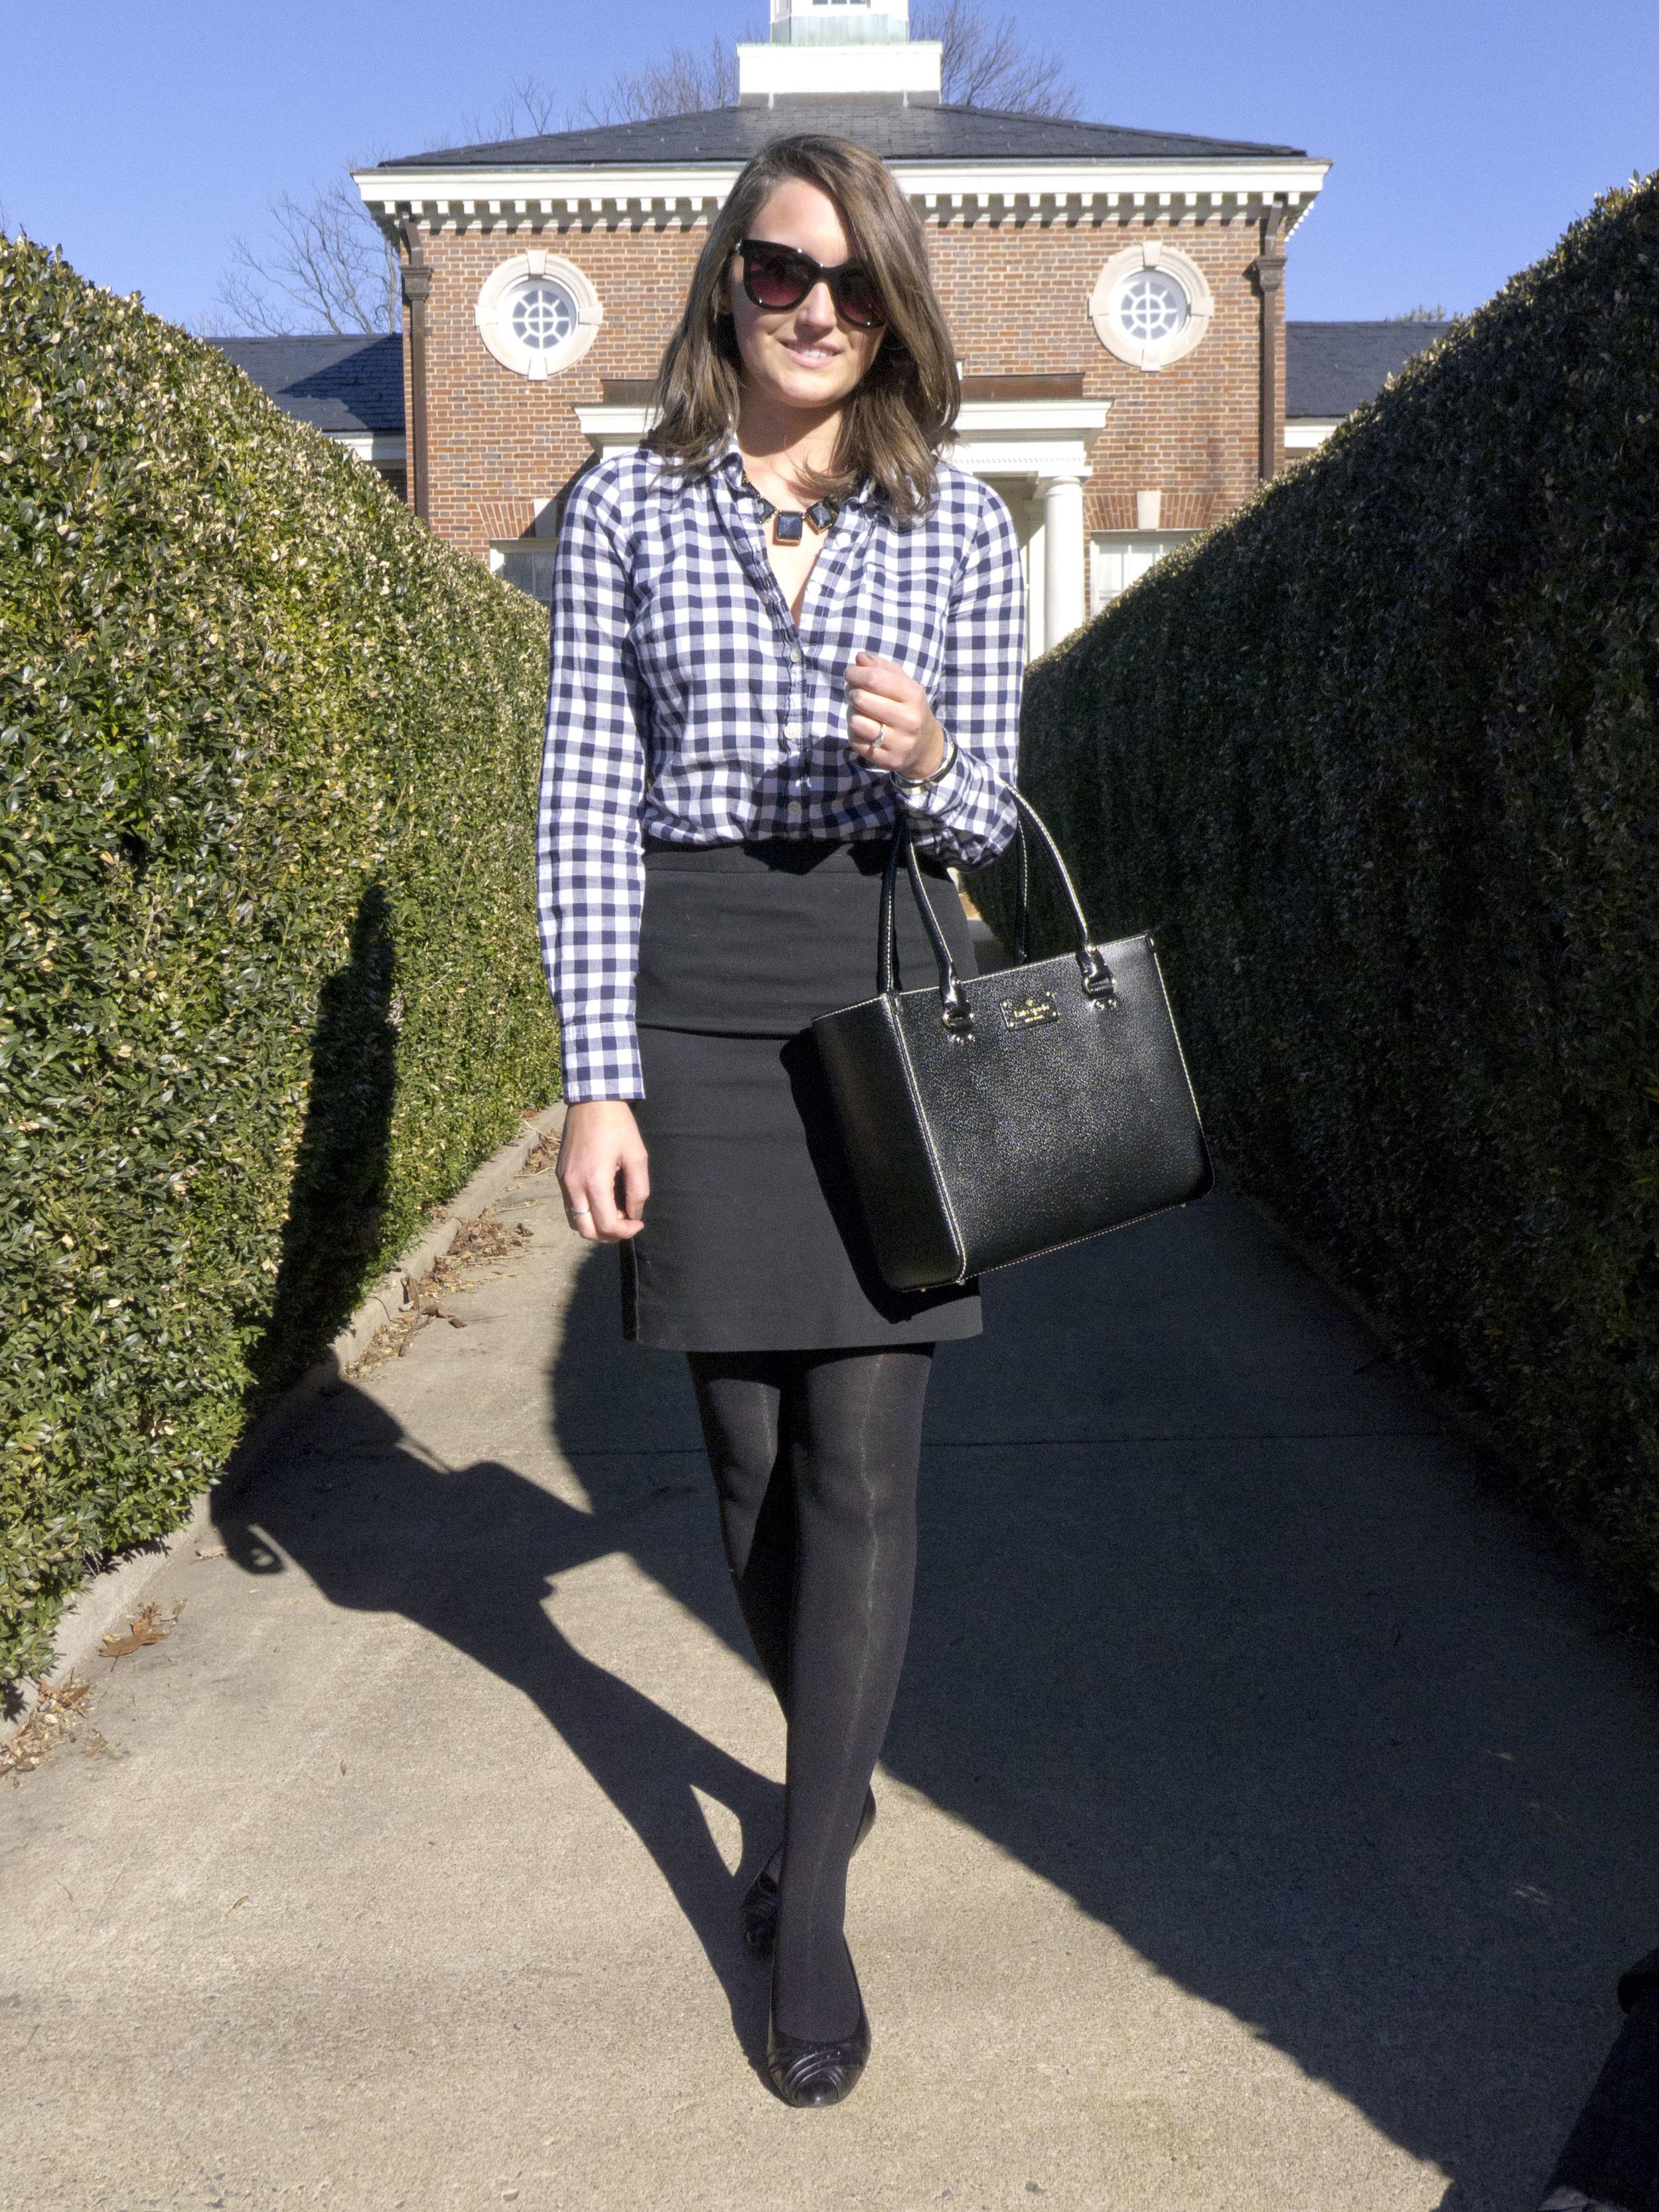 kate spade wellesley quinn handbag, classic pencil skirt gingham outfit